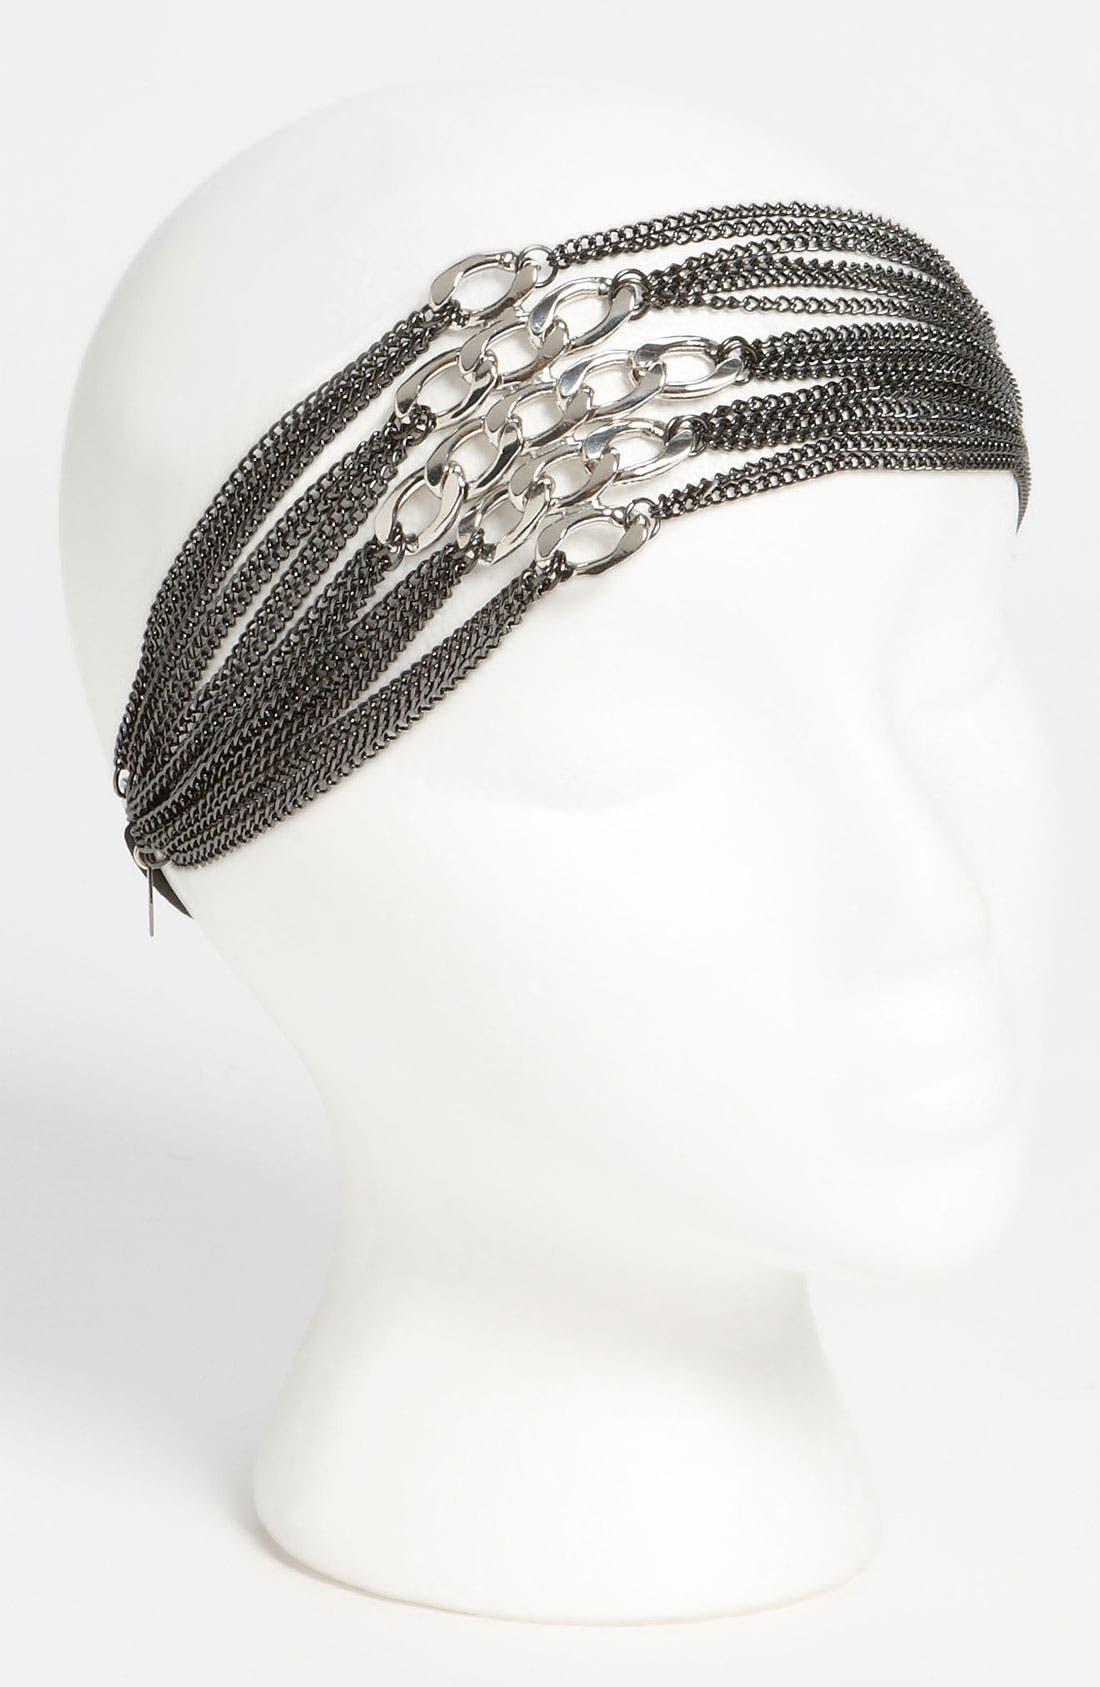 Main Image - Tasha 'Trillions of Chains' Head Wrap